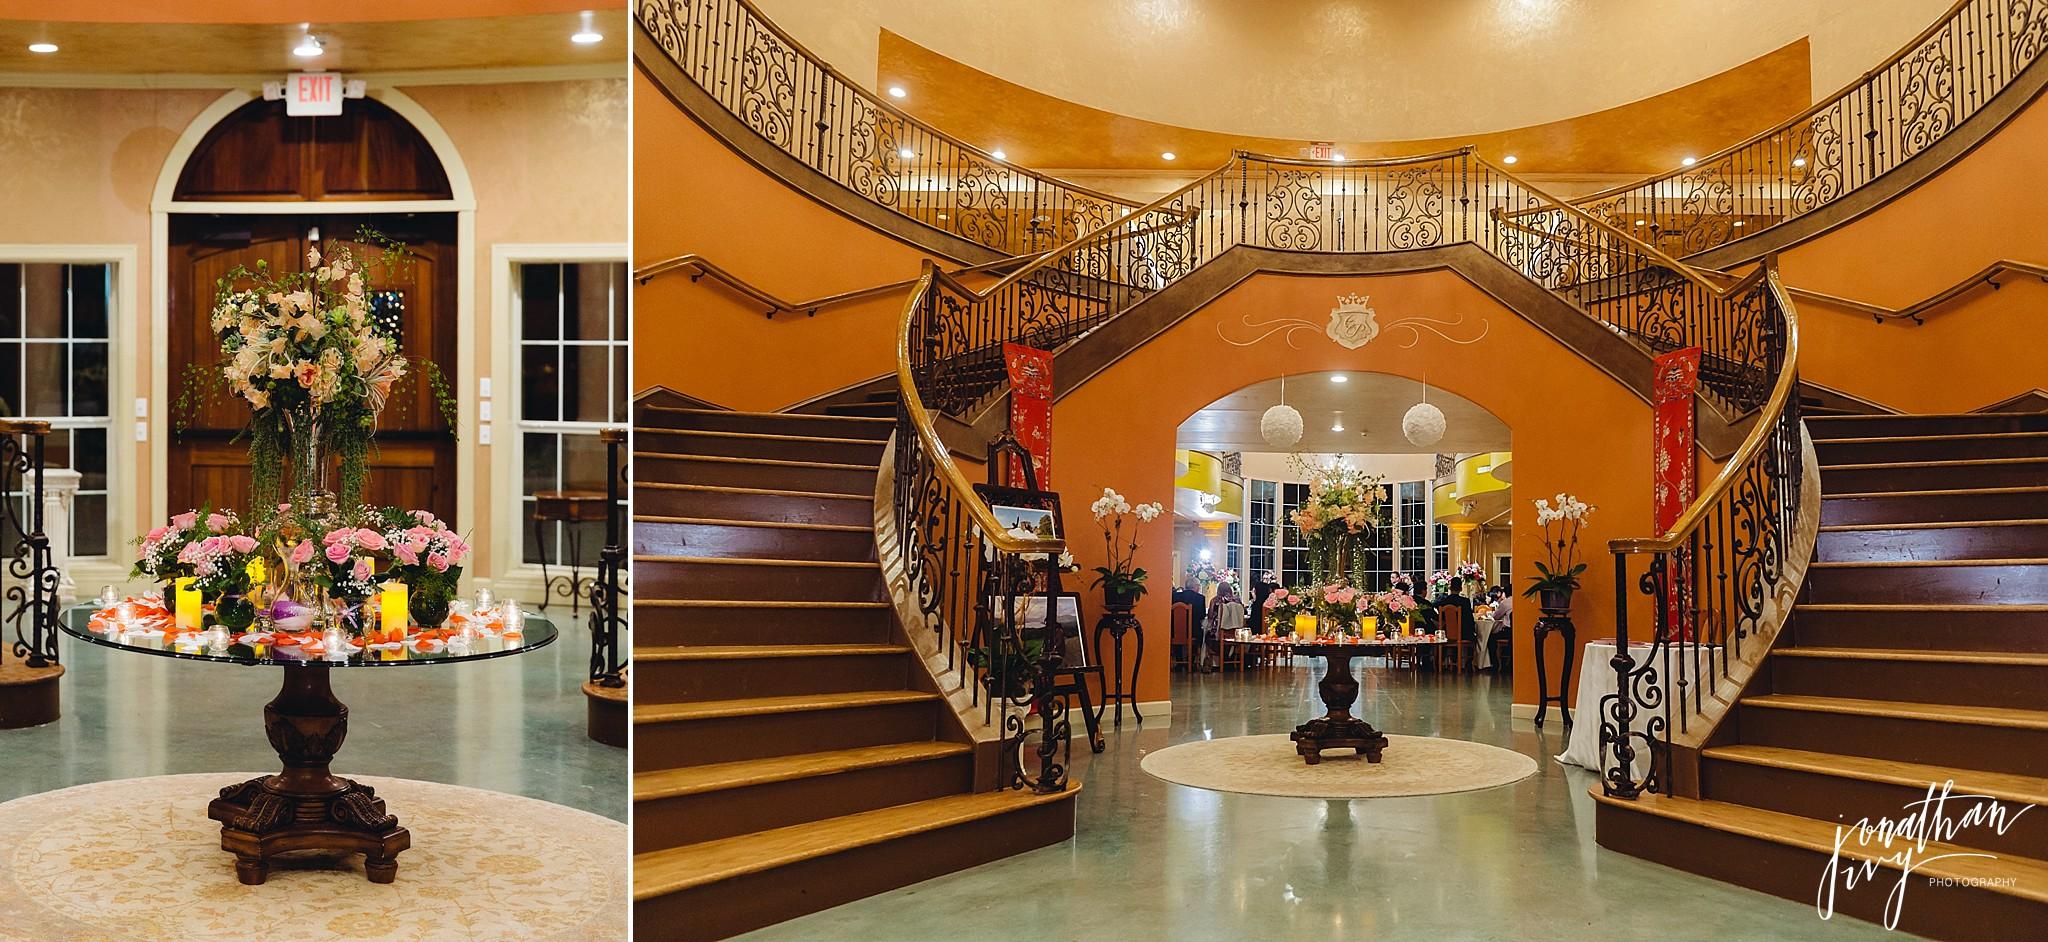 Chateau-Polonez-Wedding-Houston_0033.jpg